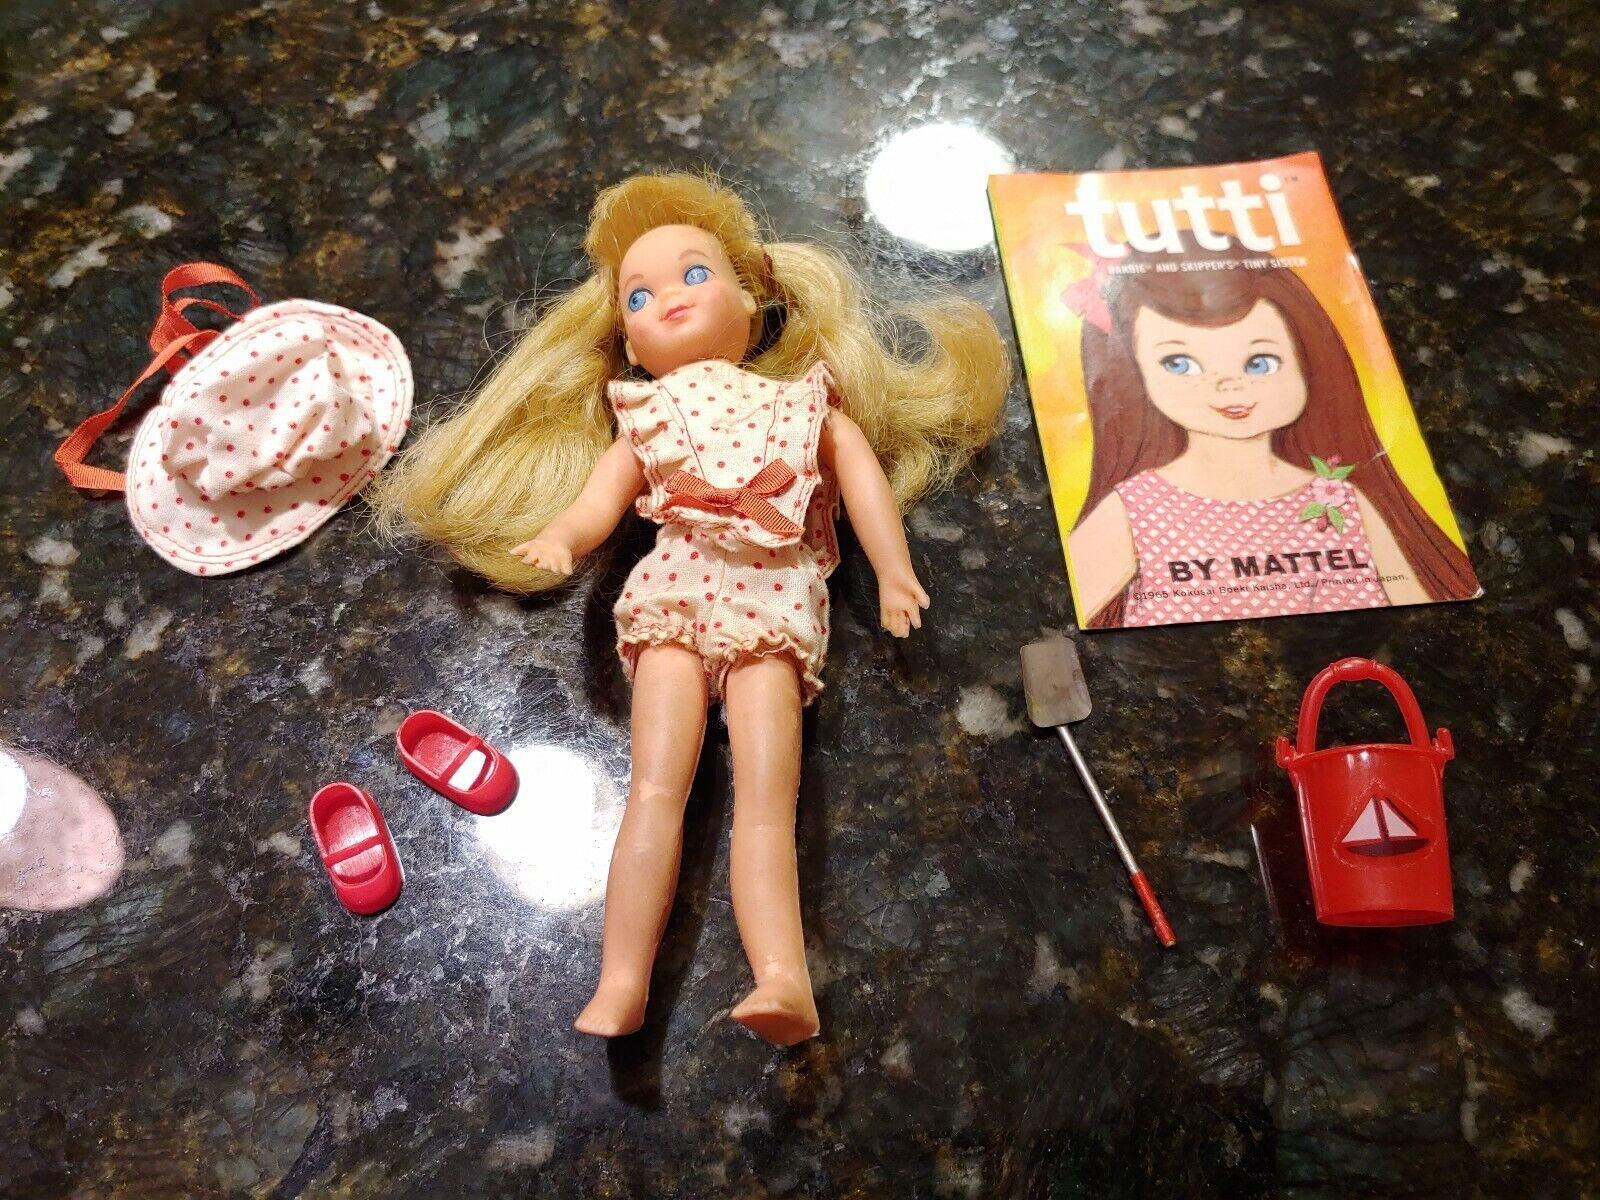 Vtg Barbie TUTTI 3603 Sand Castles Pail Shovel Jump Ropes Hat Shirt Mirror schuhe